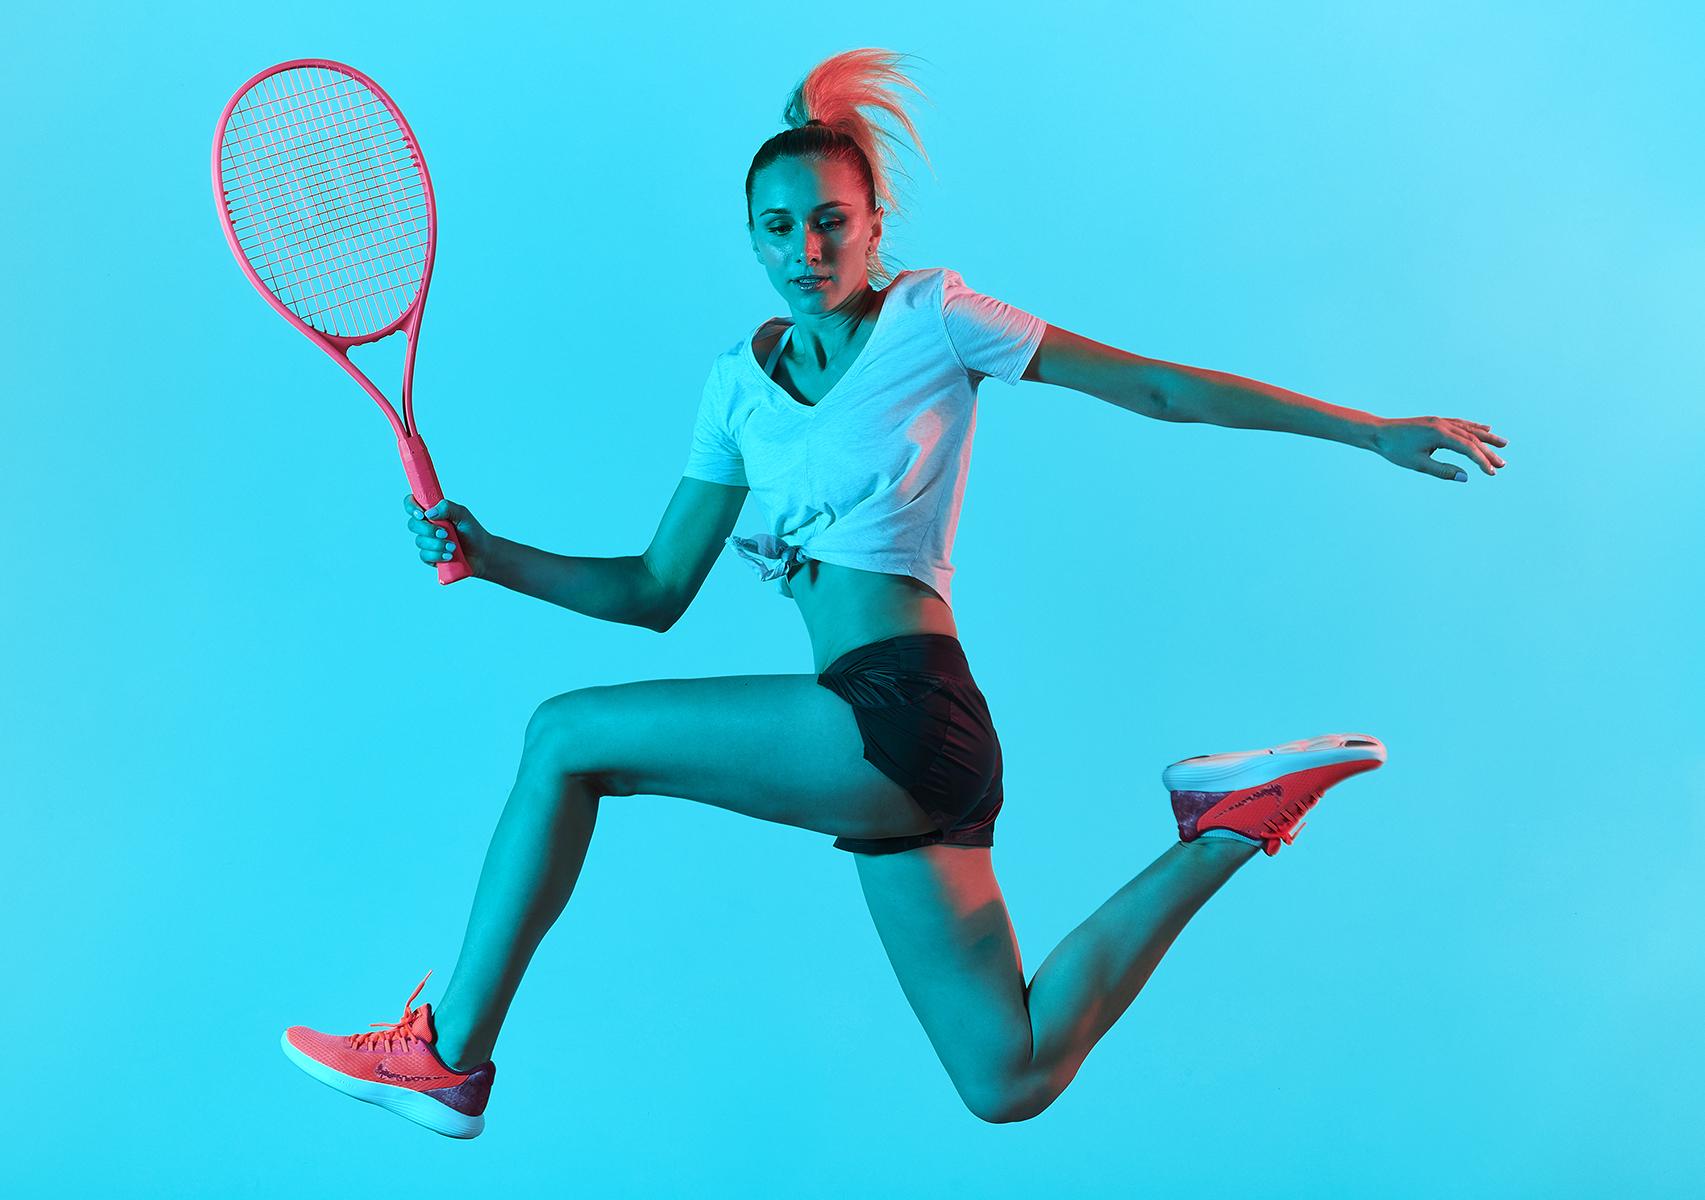 20181111_Tennis12228_FINAL_WEB.jpg